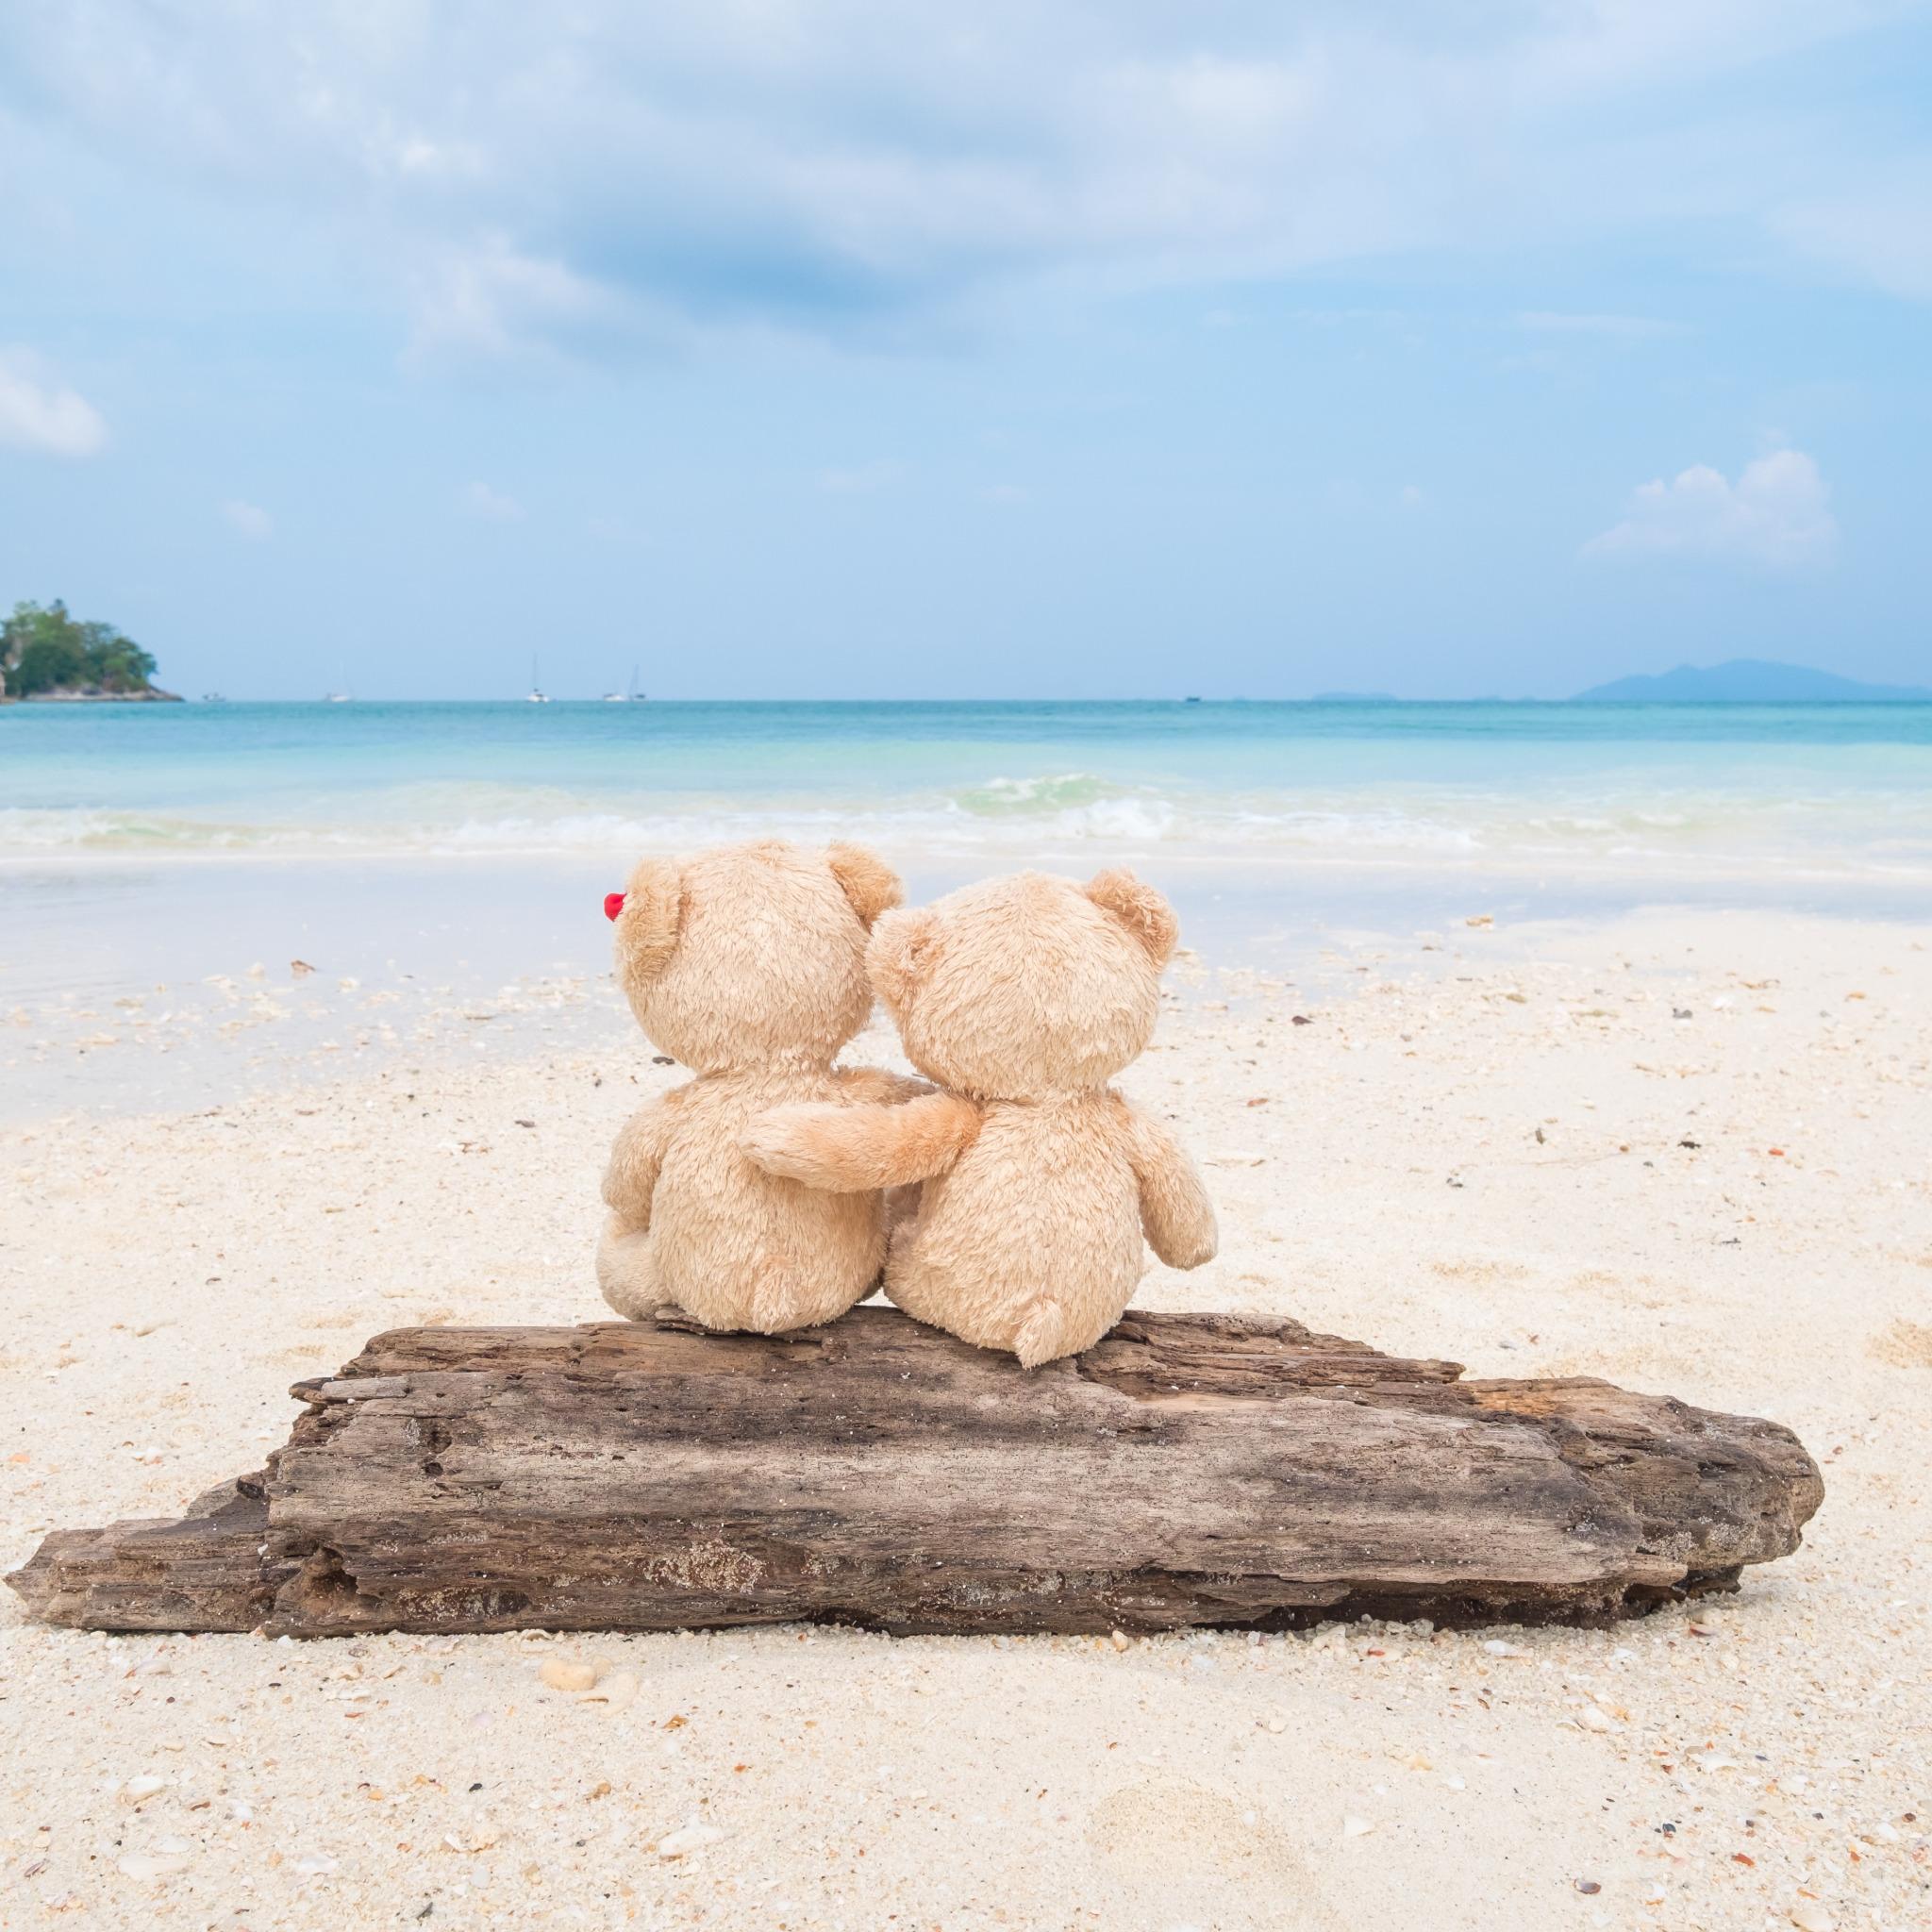 это картинка игрушка на берегу моря куча